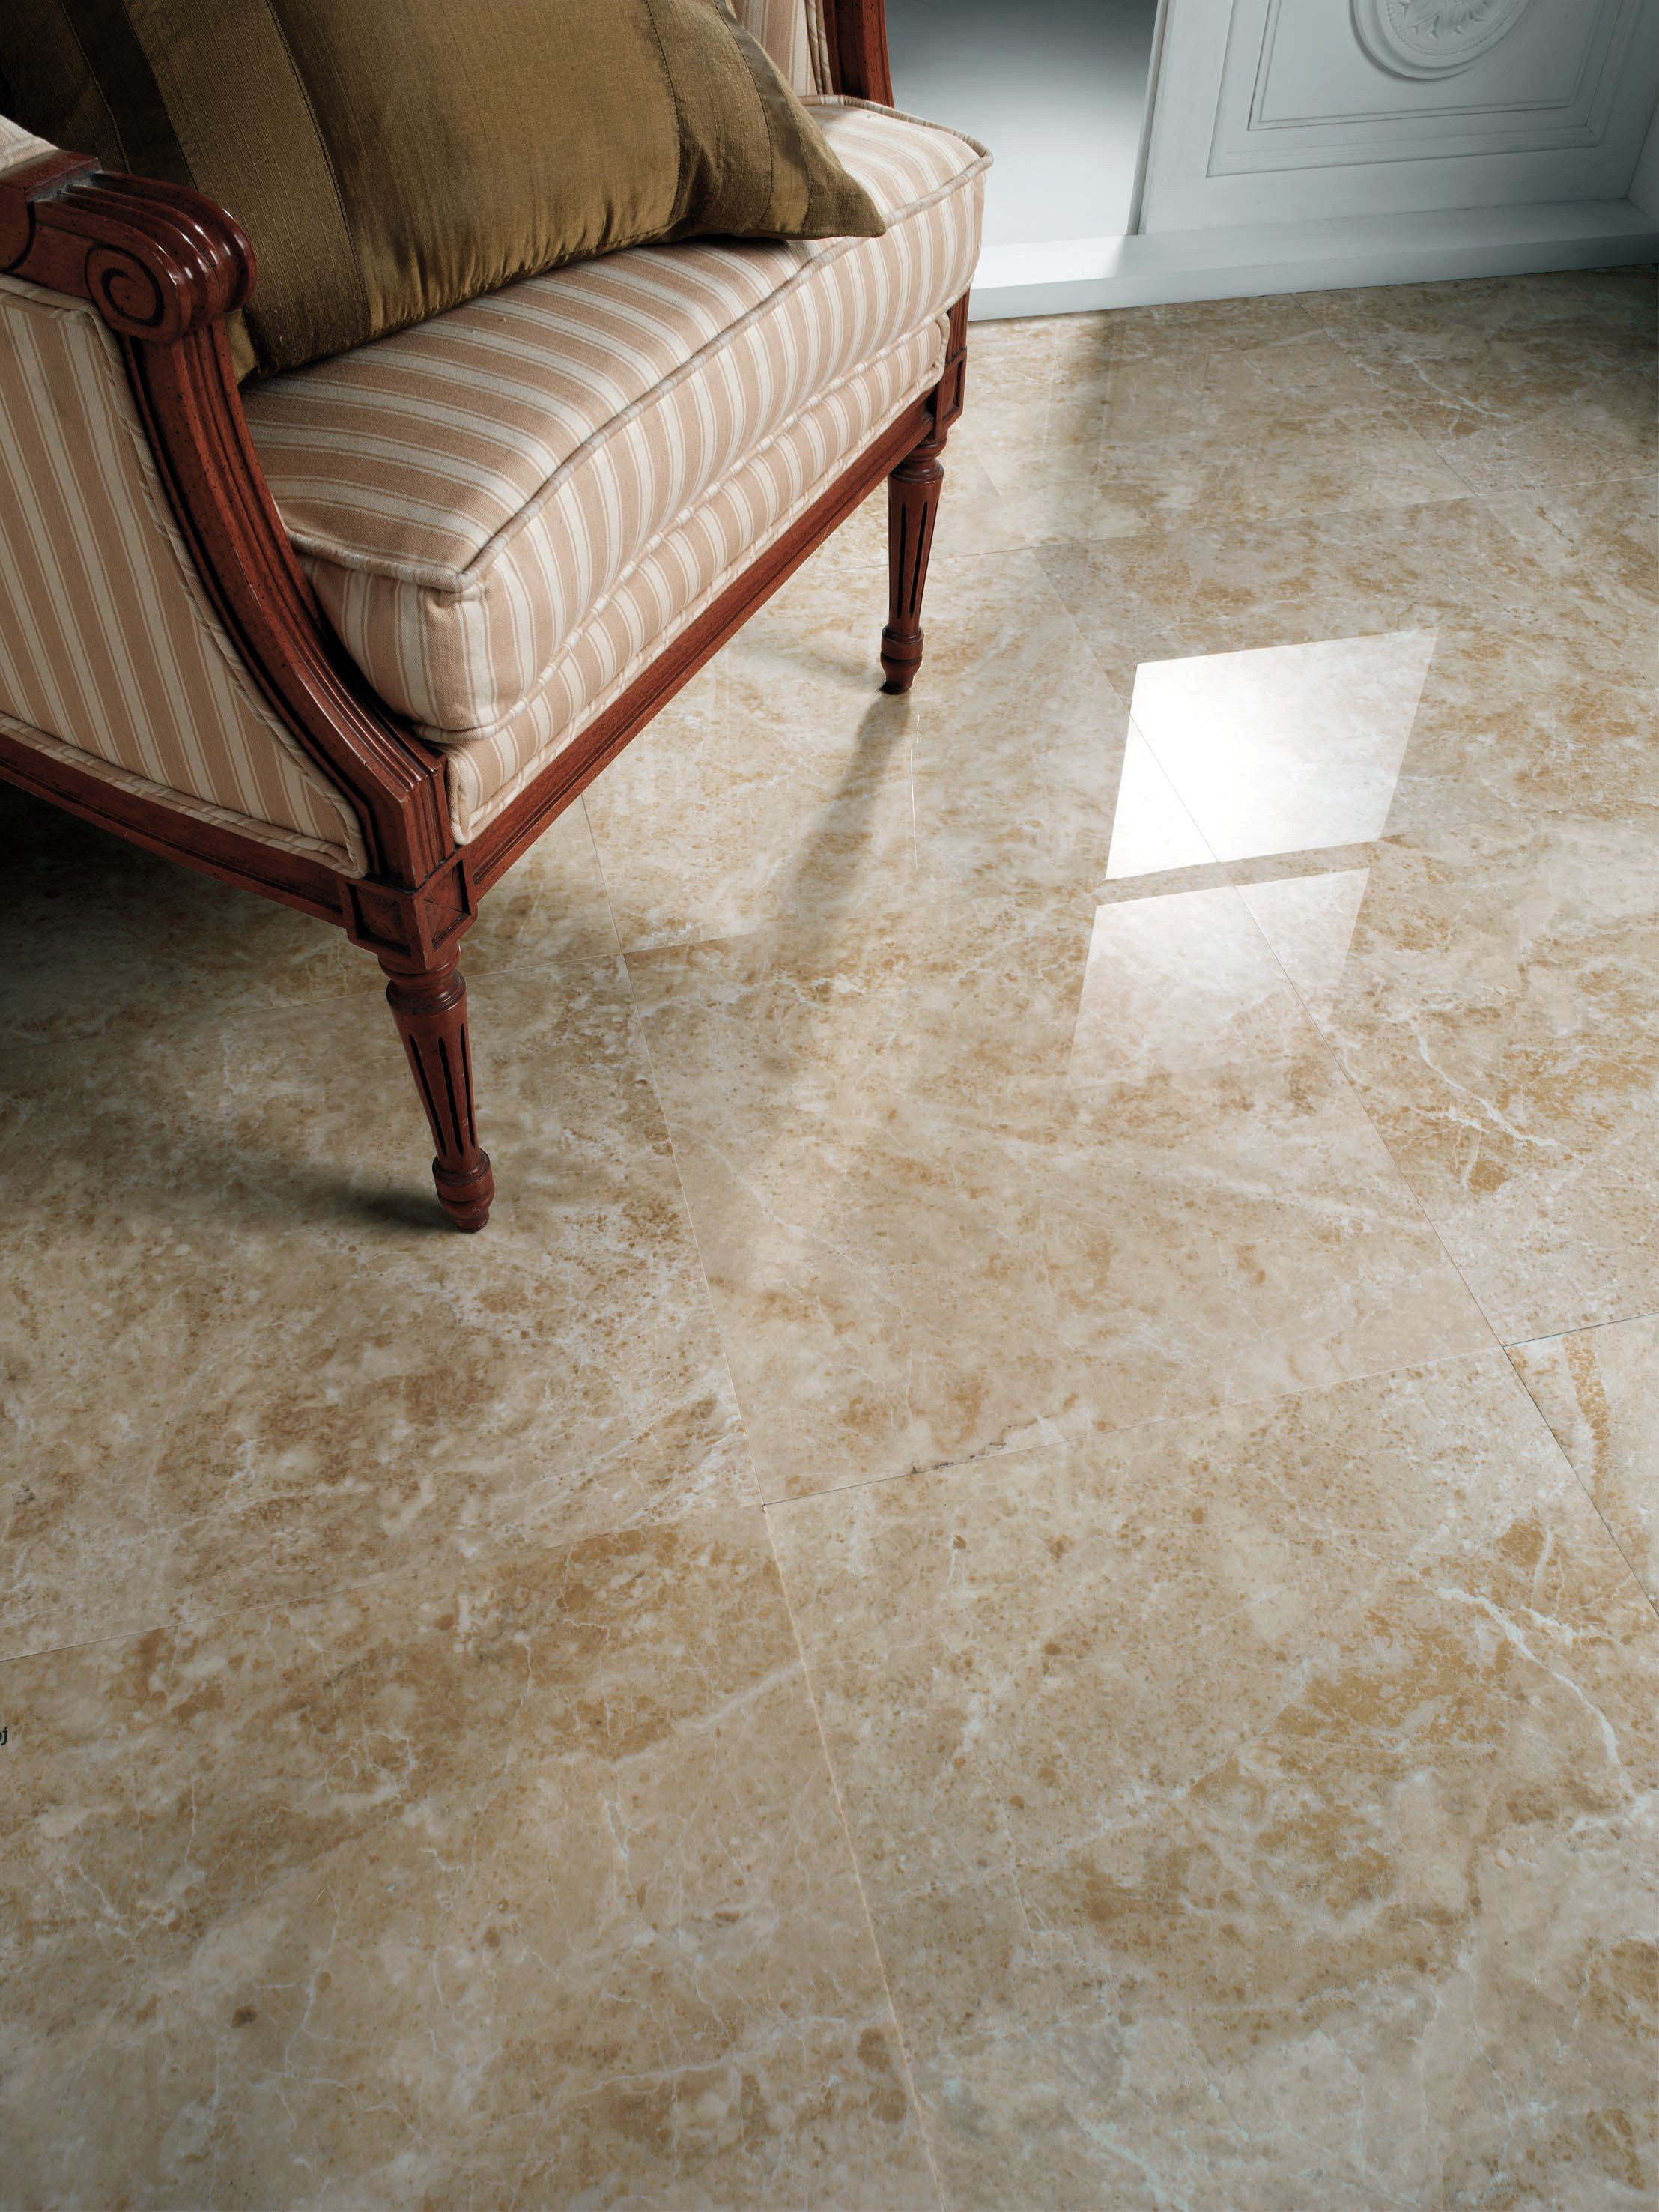 Cesena floor tiles emperador marble effect a new luxury beige cesena floor tiles emperador marble effect a new luxury beige and brown emperador marble dailygadgetfo Image collections